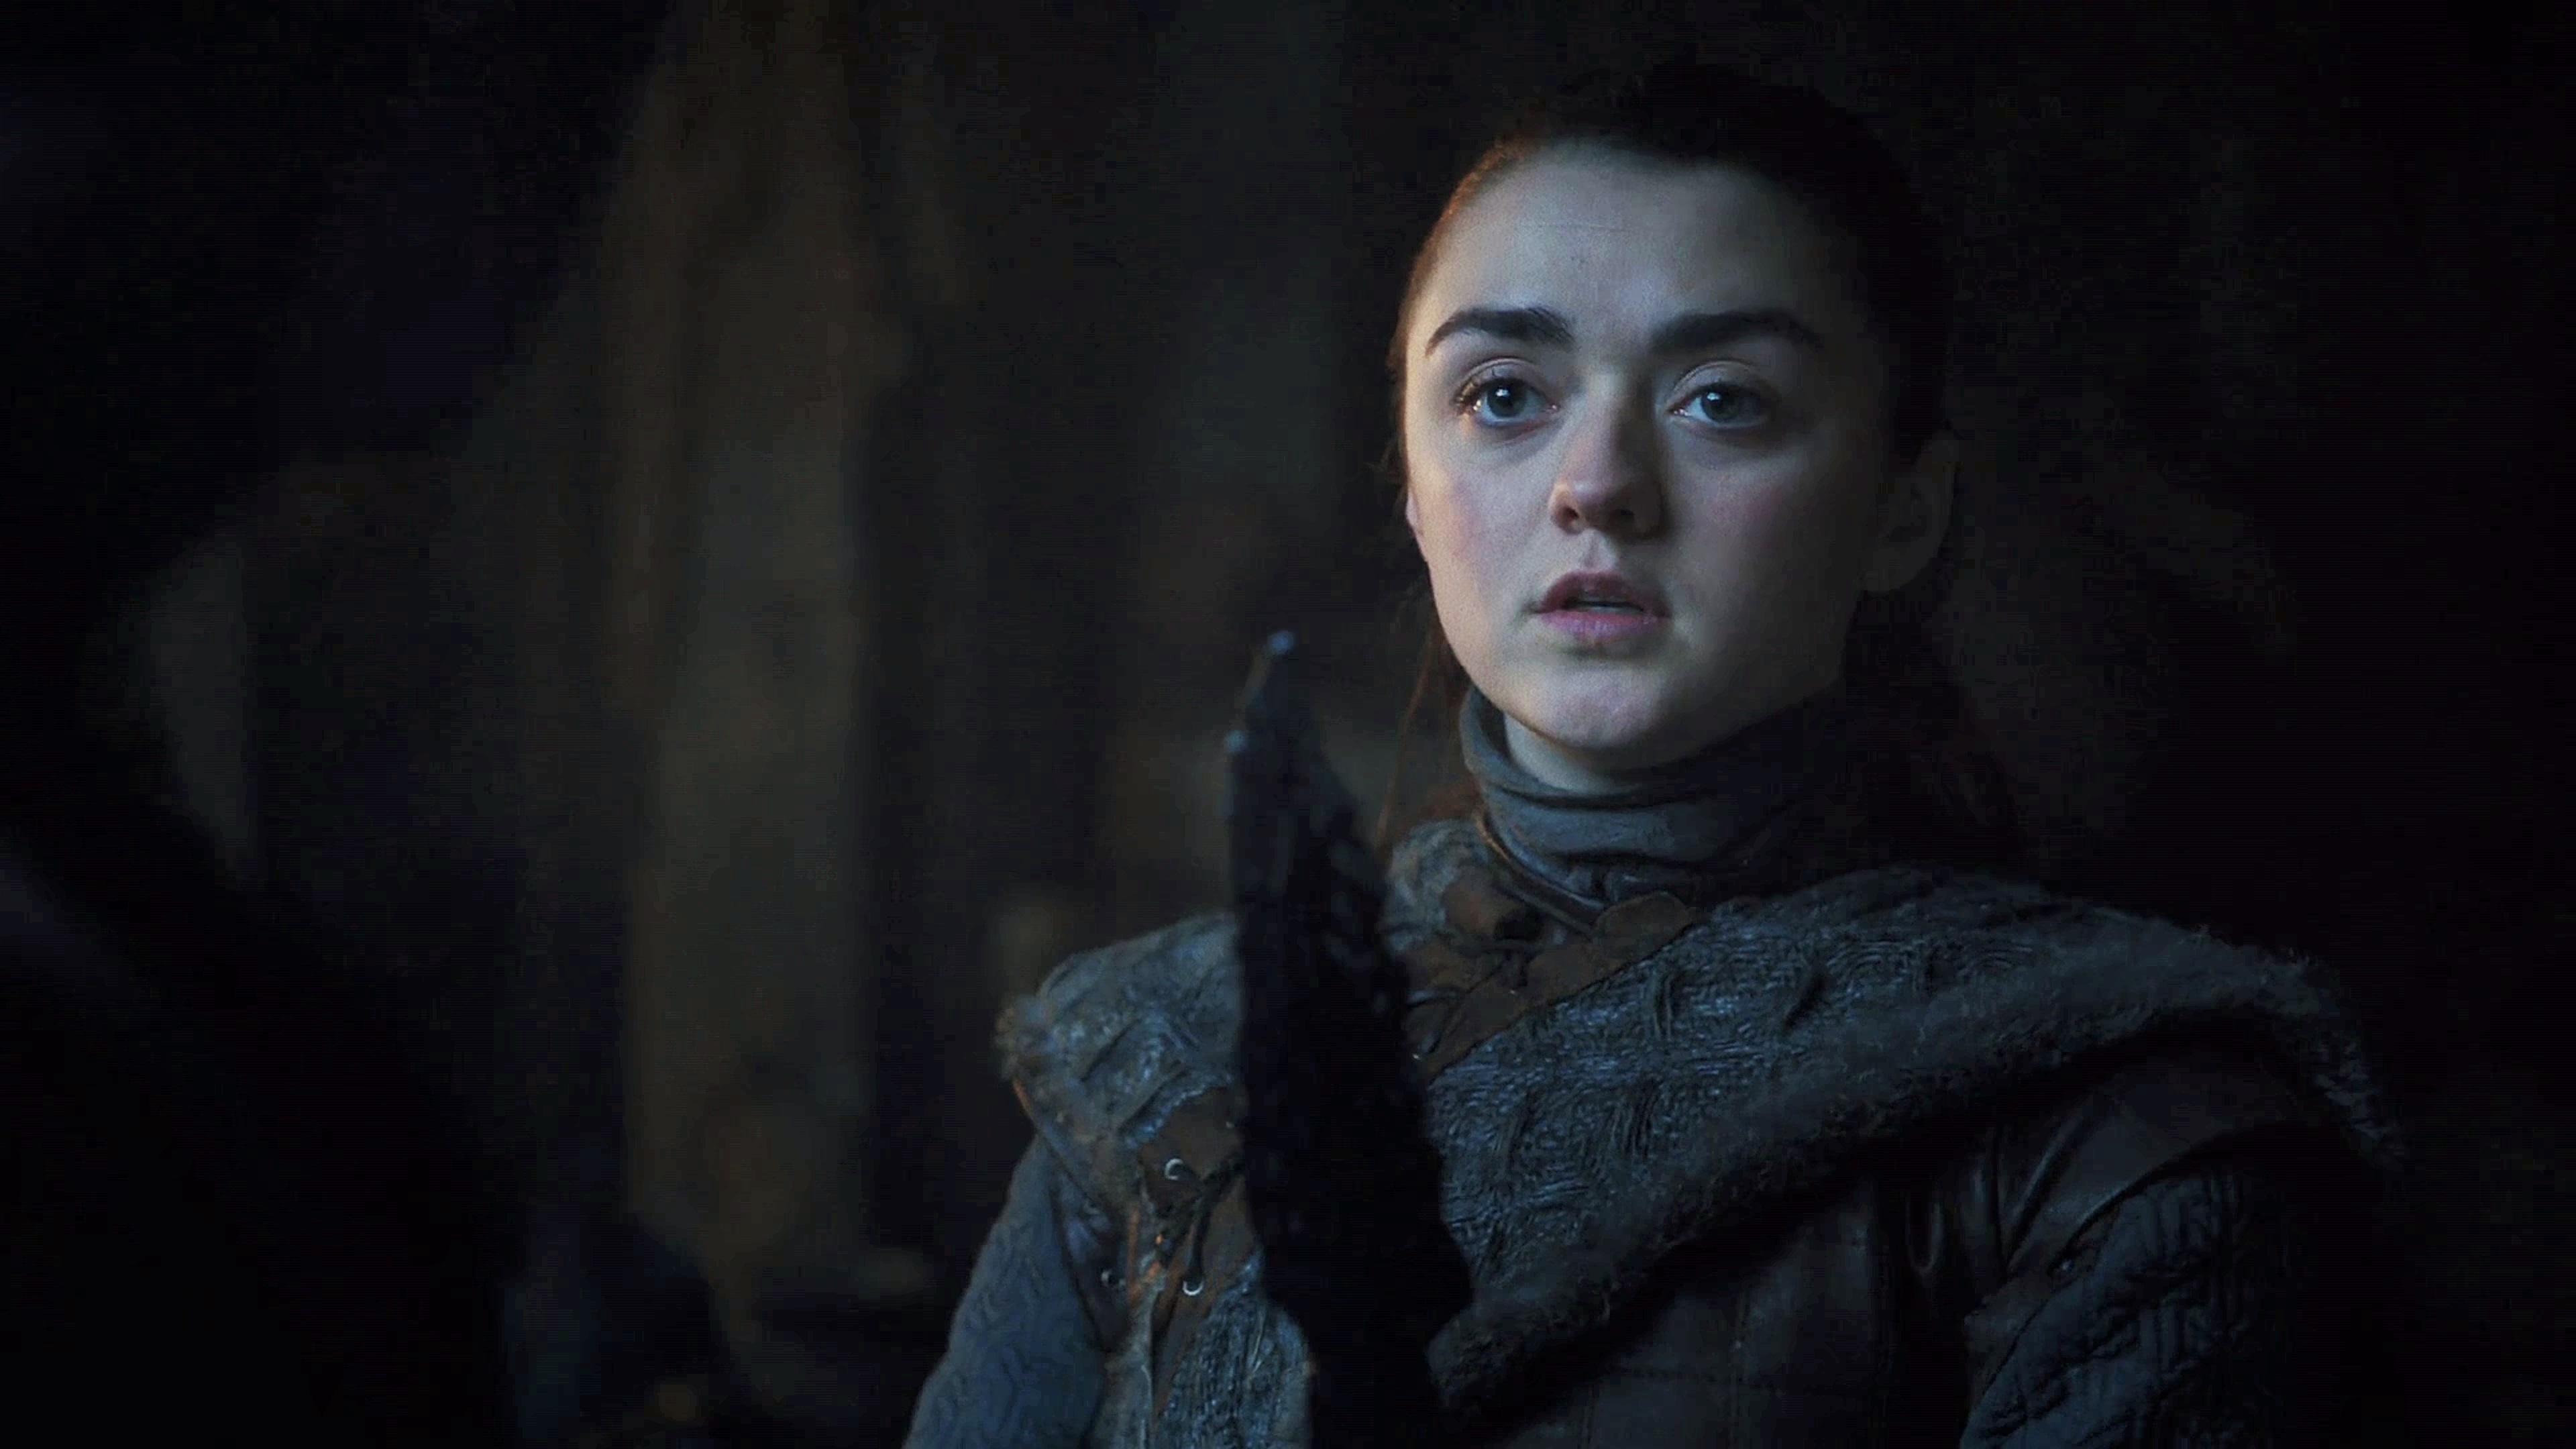 5. Season 8 Trailer Arya Stark Dragonglass Death